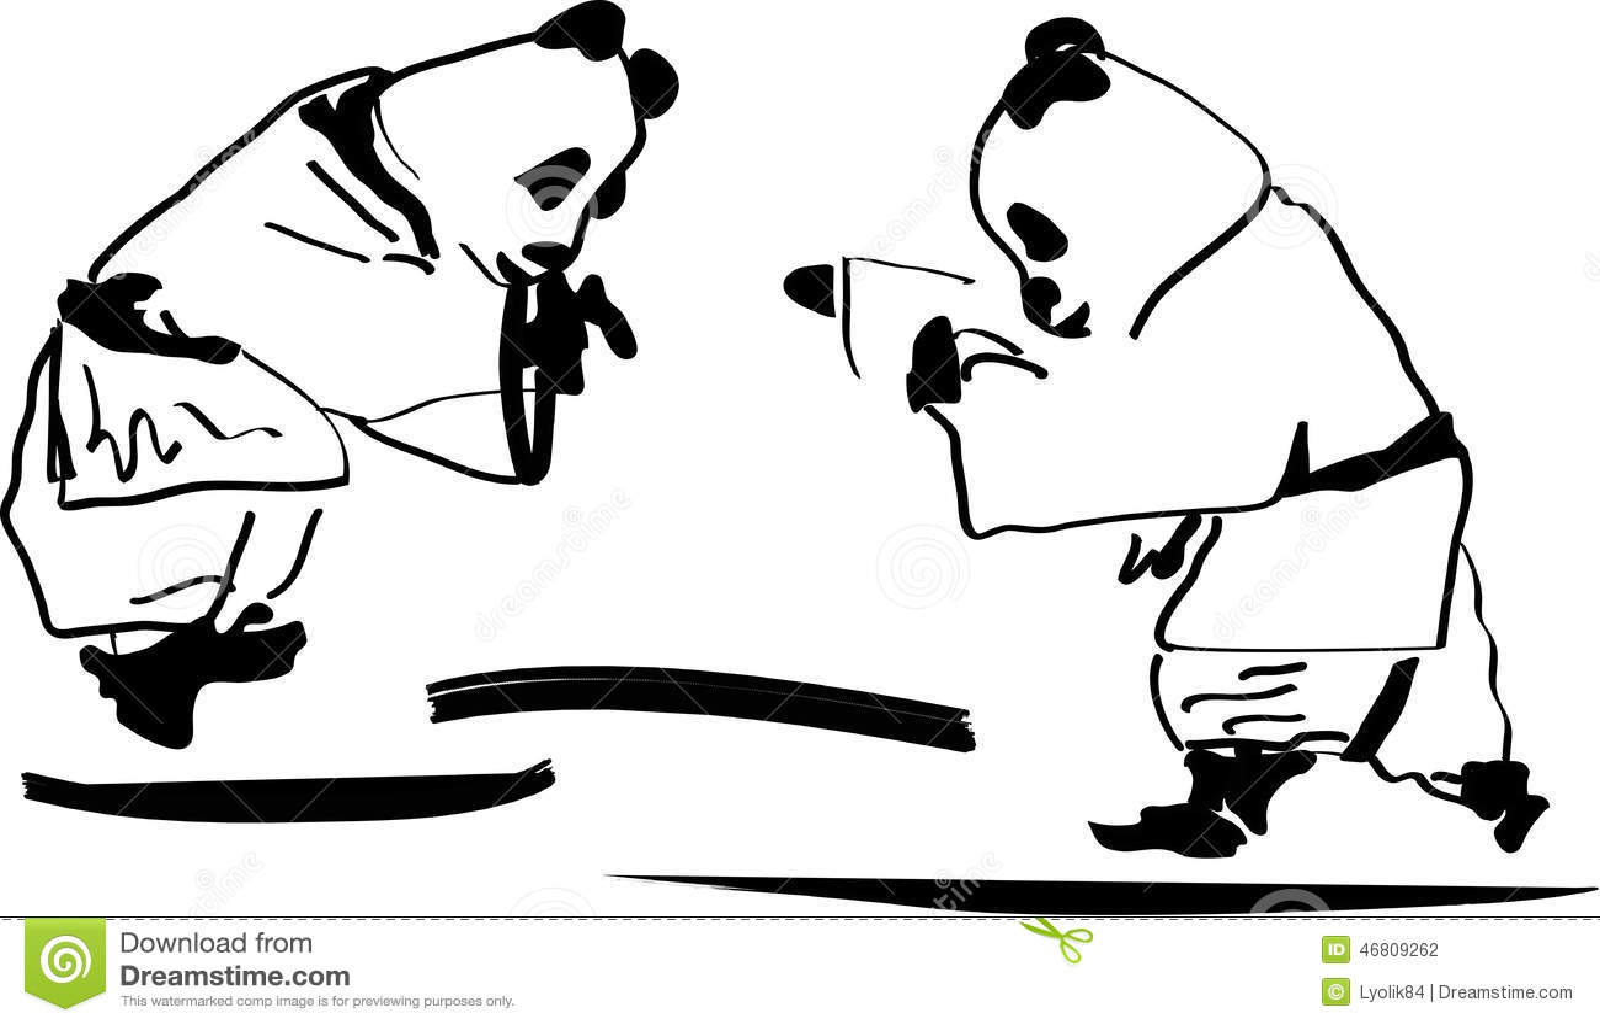 Panda Fight панда борьба Stock Vector - Image: 46809262